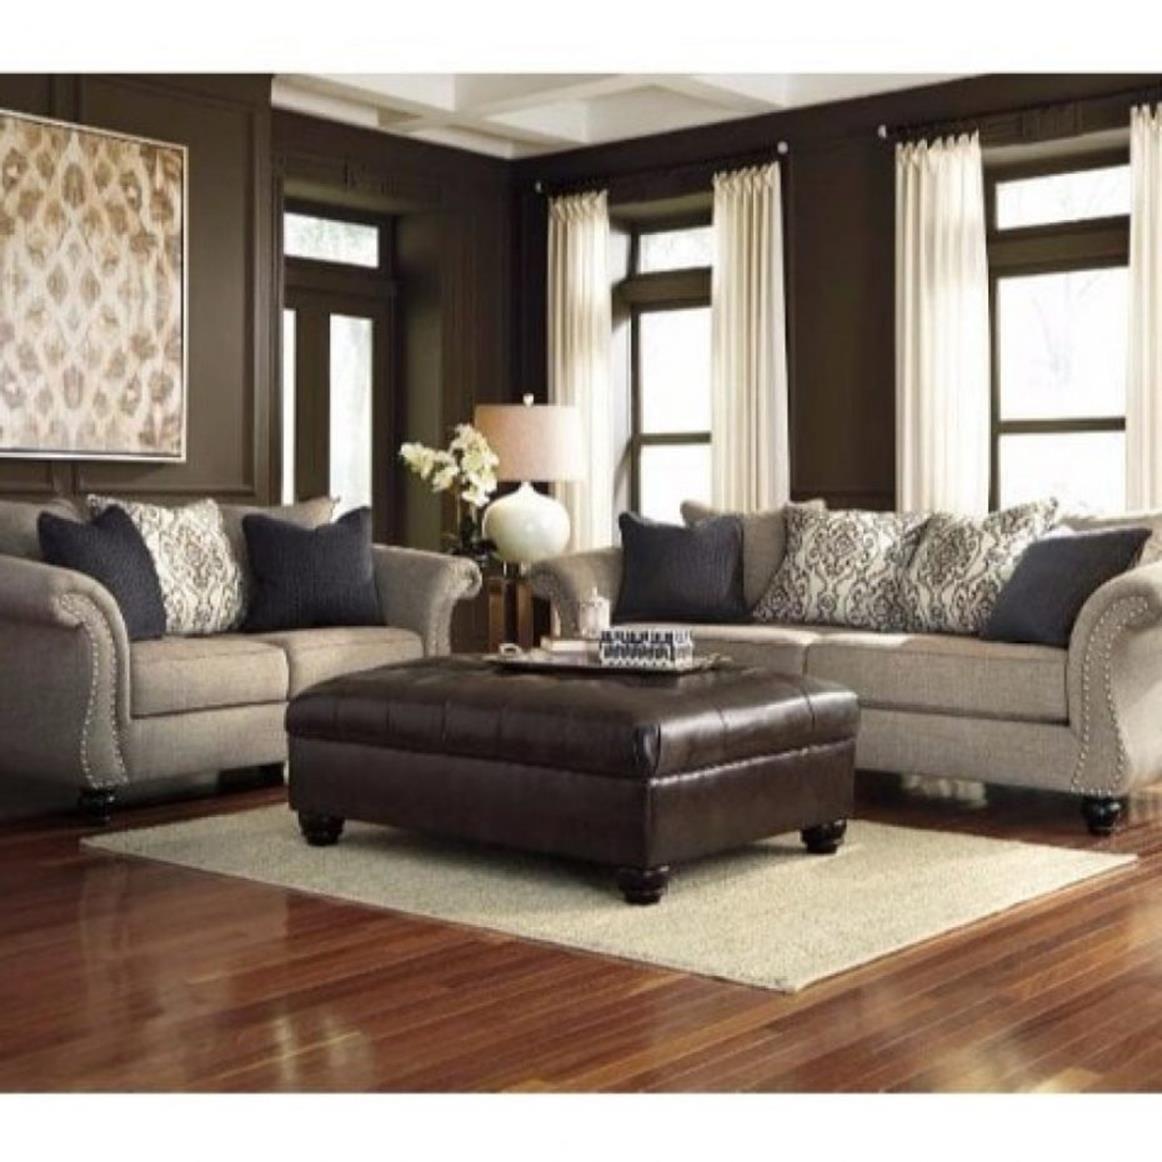 inexpensive ikea living room furniture sets ideas 7